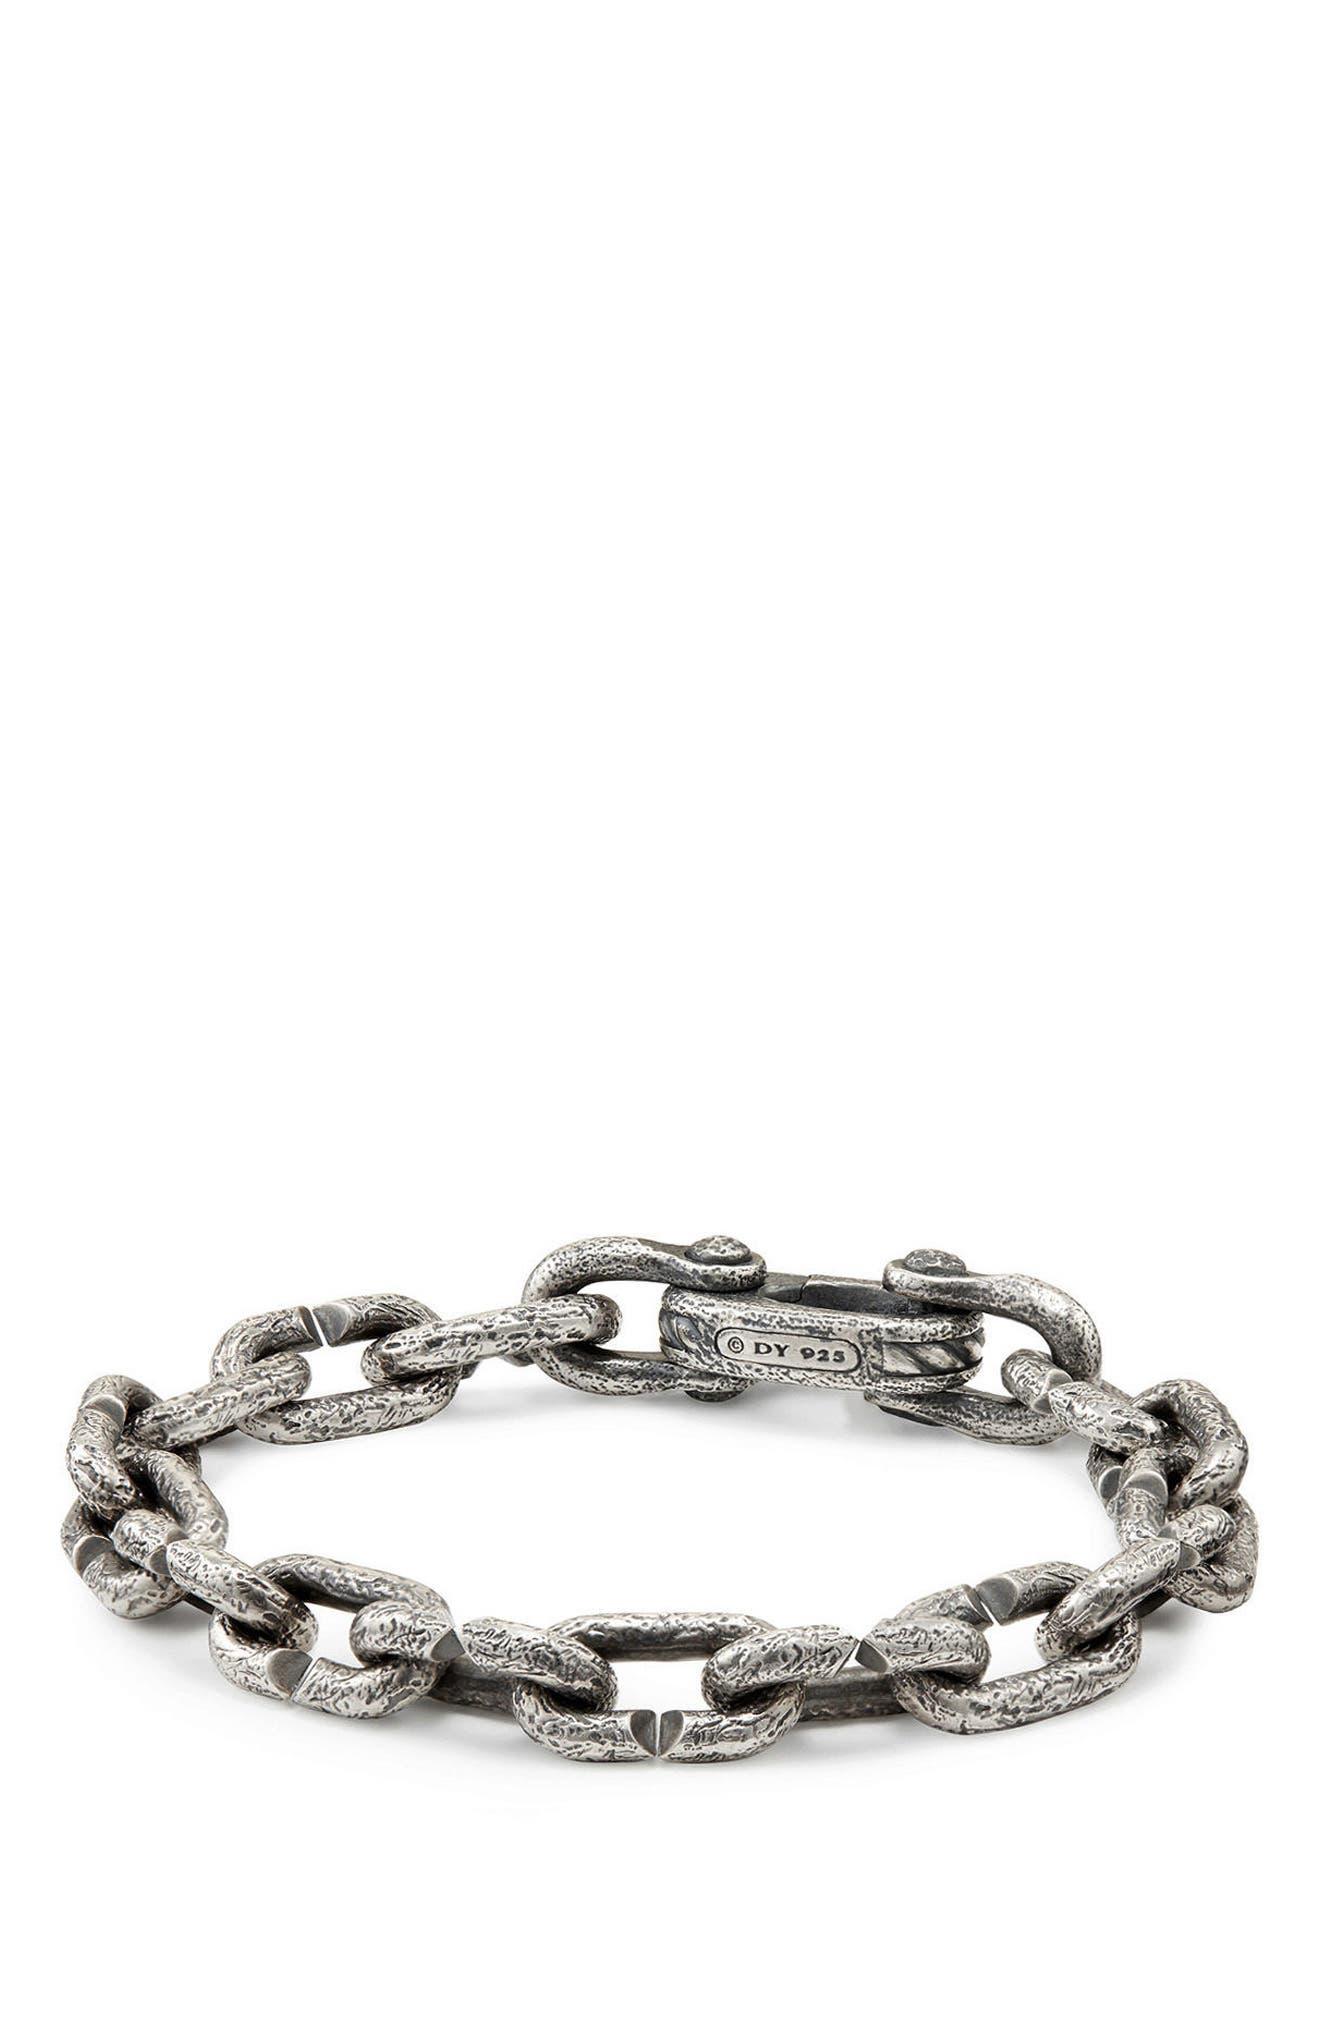 Shipwreck Chain Bracelet,                         Main,                         color, Silver